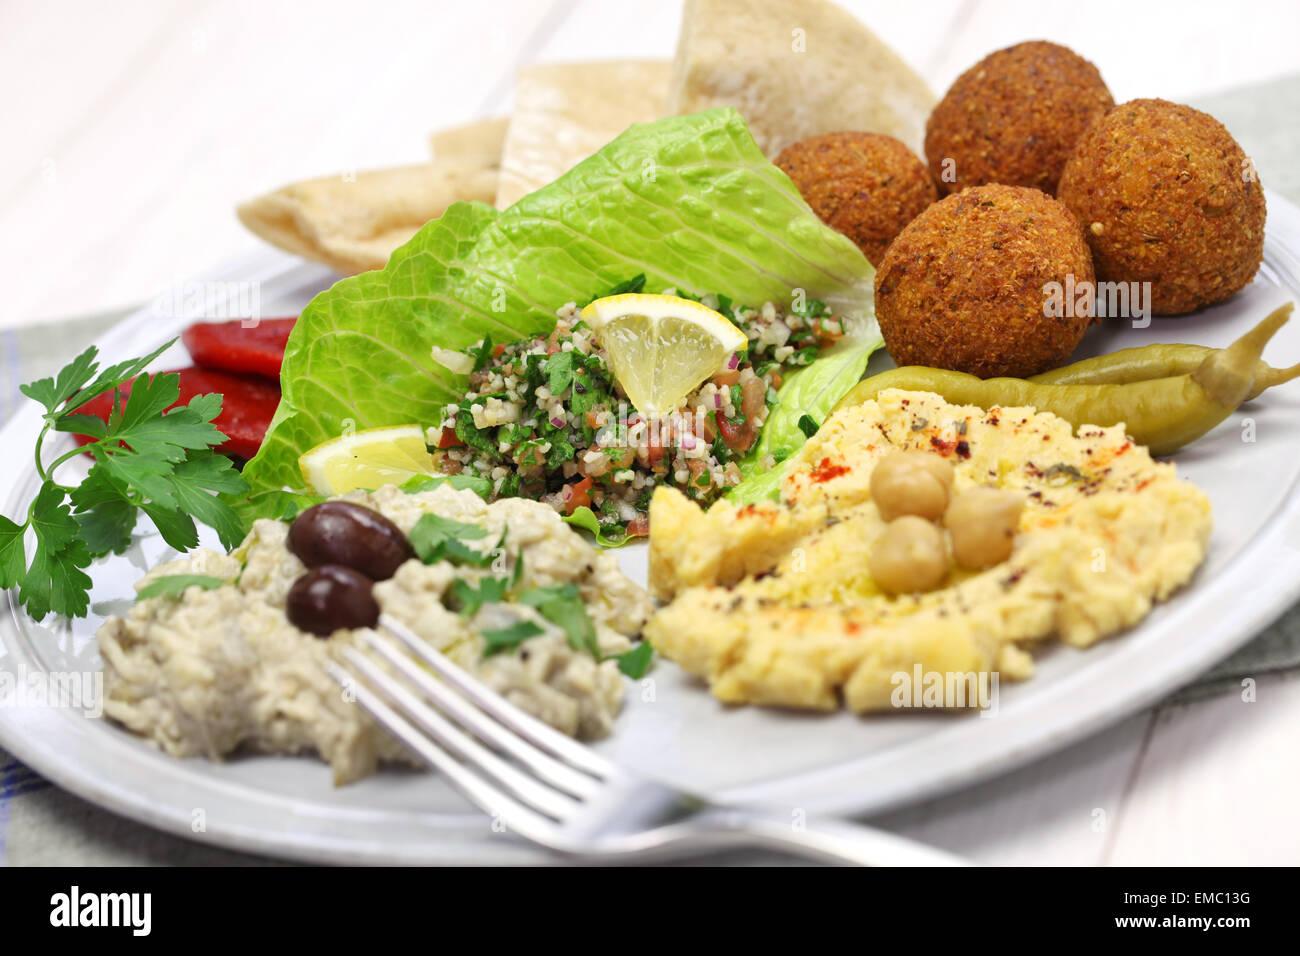 Hummus, falafel, Baba ghanoush, tabulé e pita, cucina medio orientale Immagini Stock